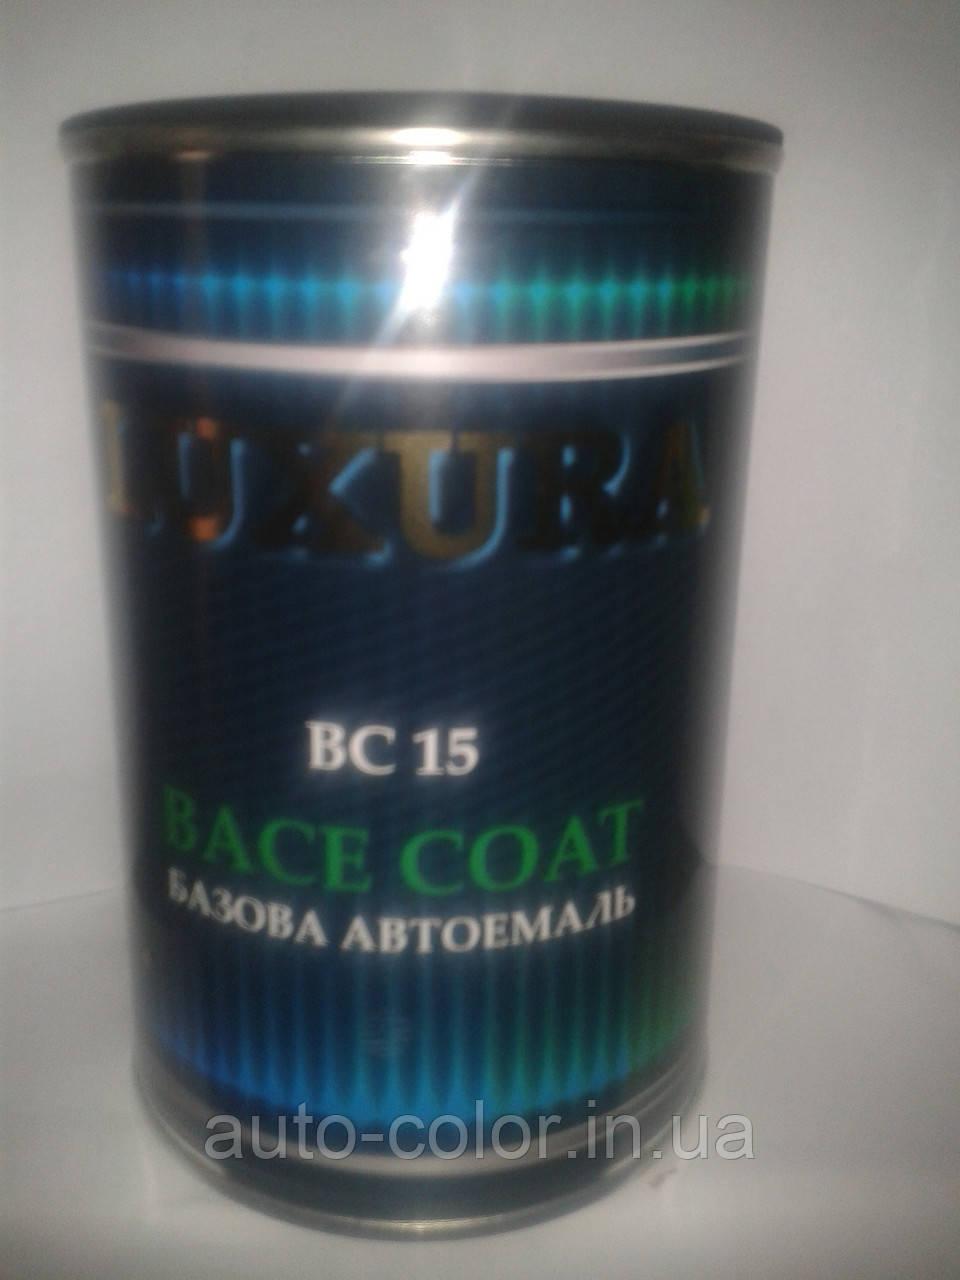 40U DAEWOO  Базовая автоэмаль Luxura 1 л